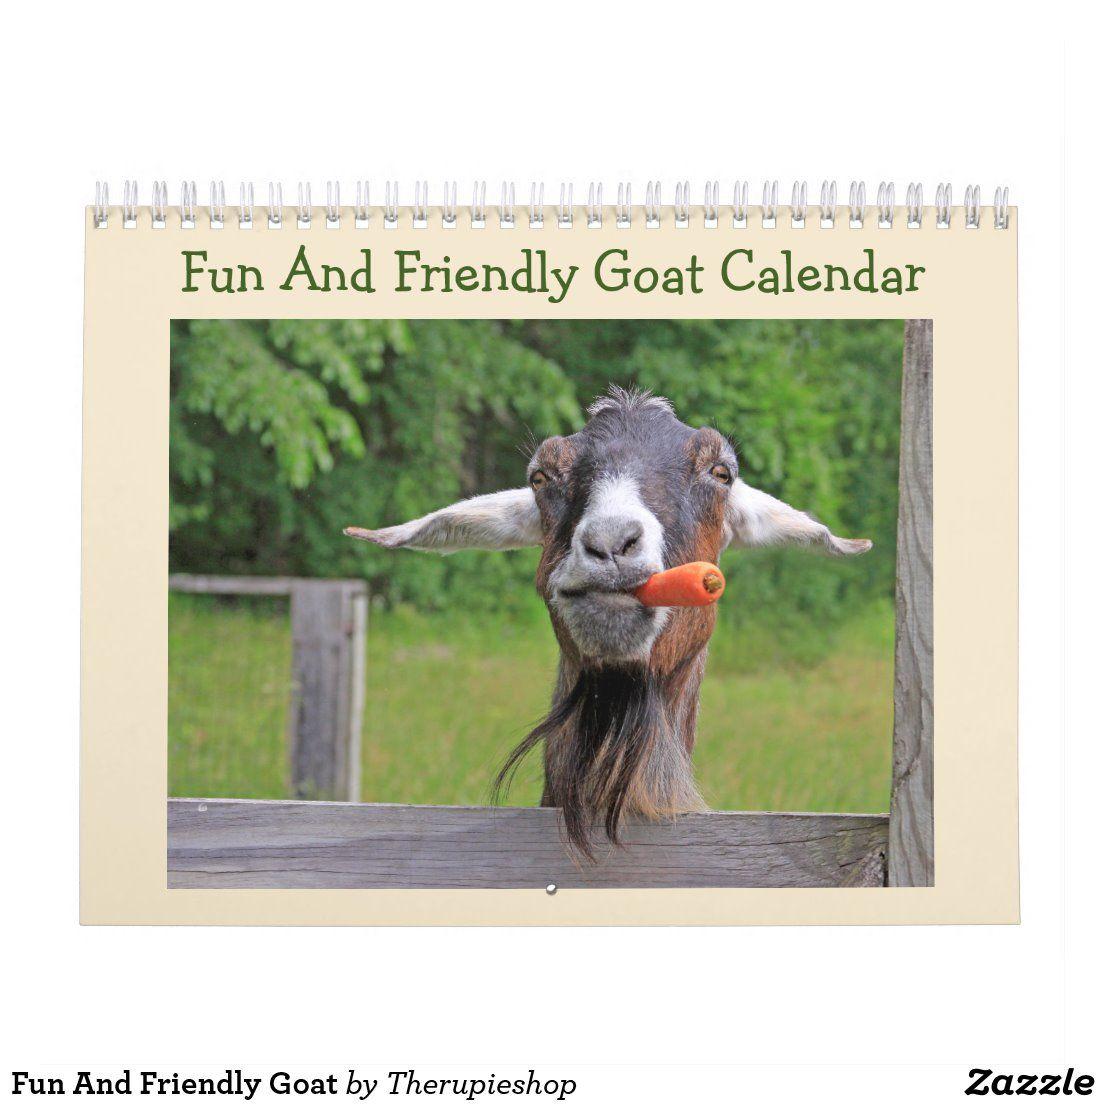 Fun and friendly goat calendar goats funny